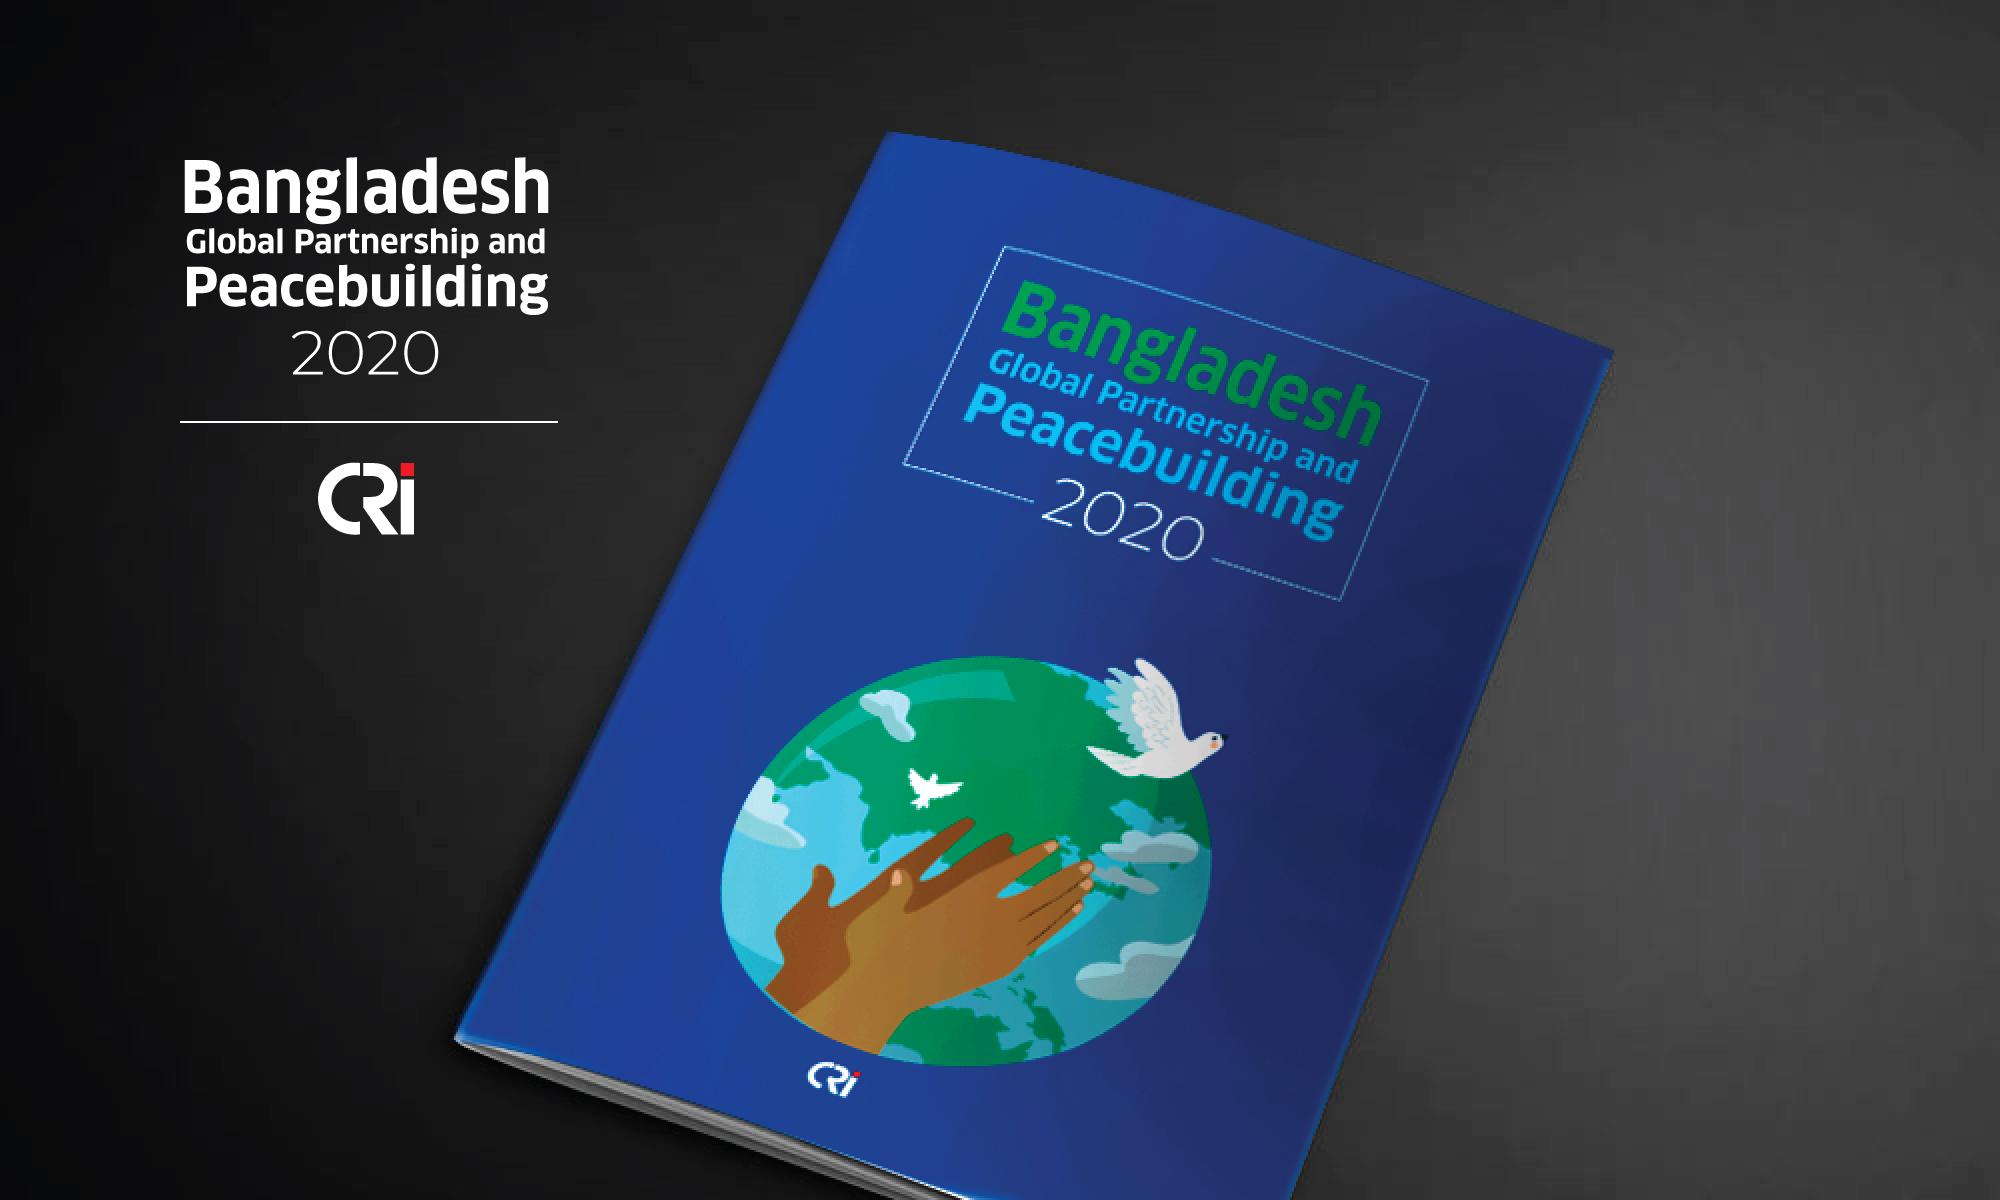 Bangladesh Global Partnership and Peacebuilding 2020